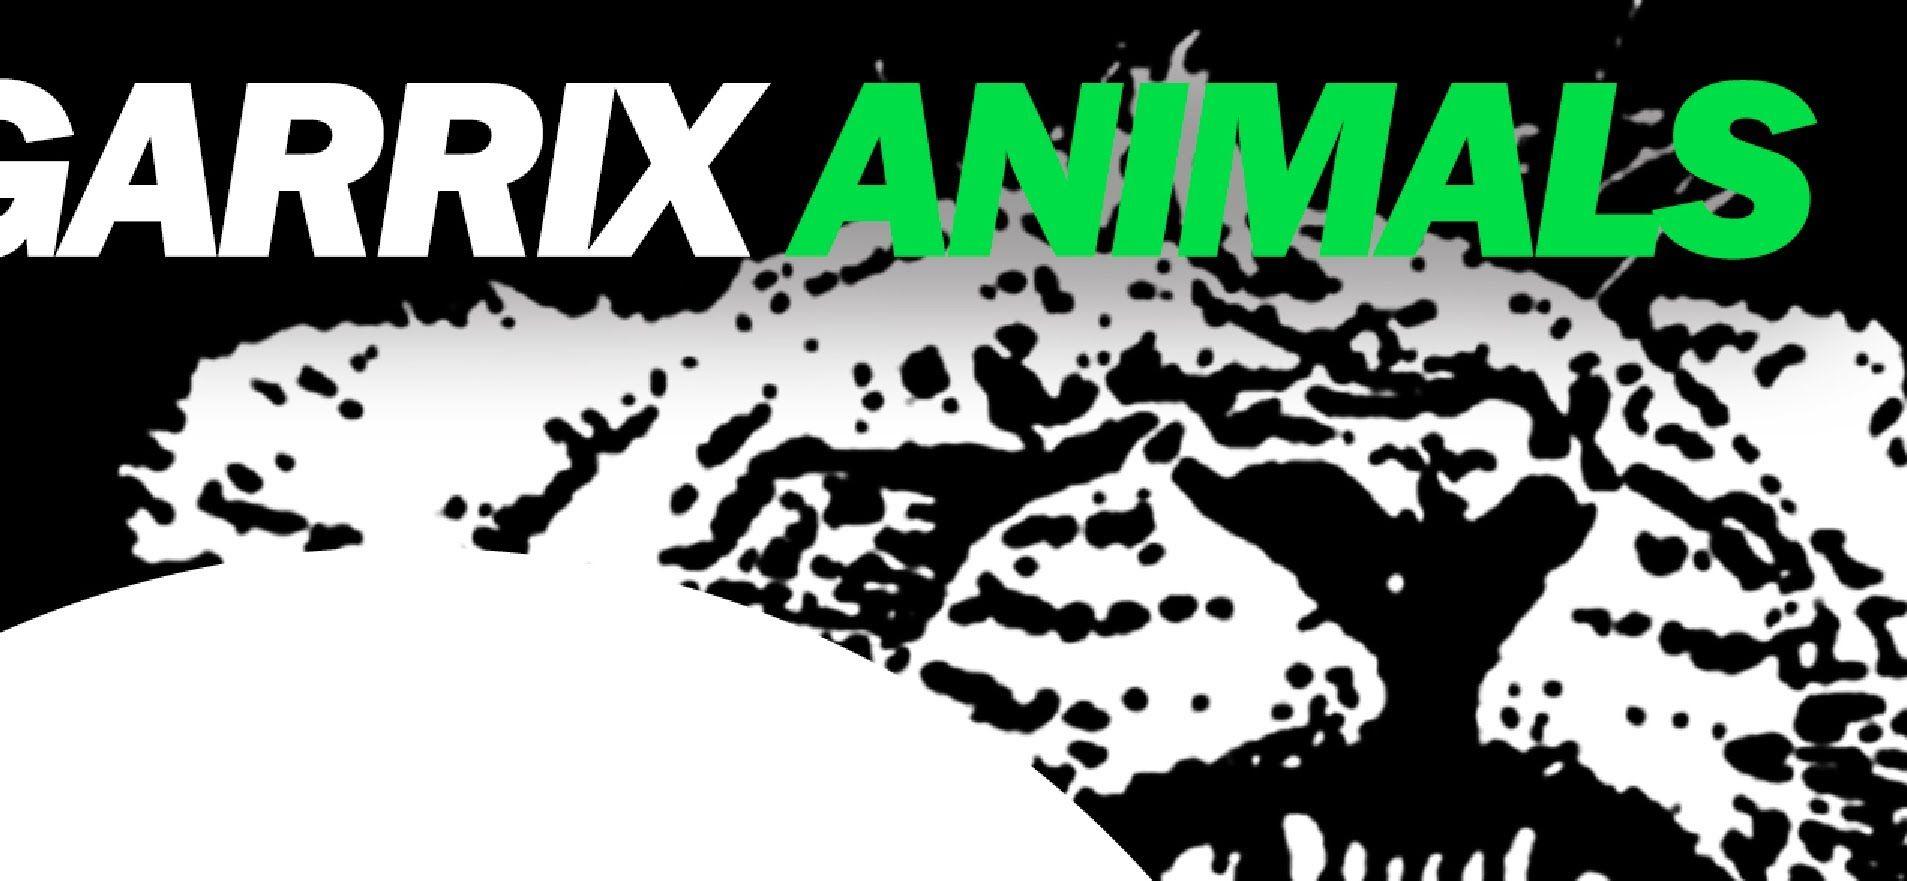 Martin Garrix Animals!! Ahhhh this beat is sooo sick